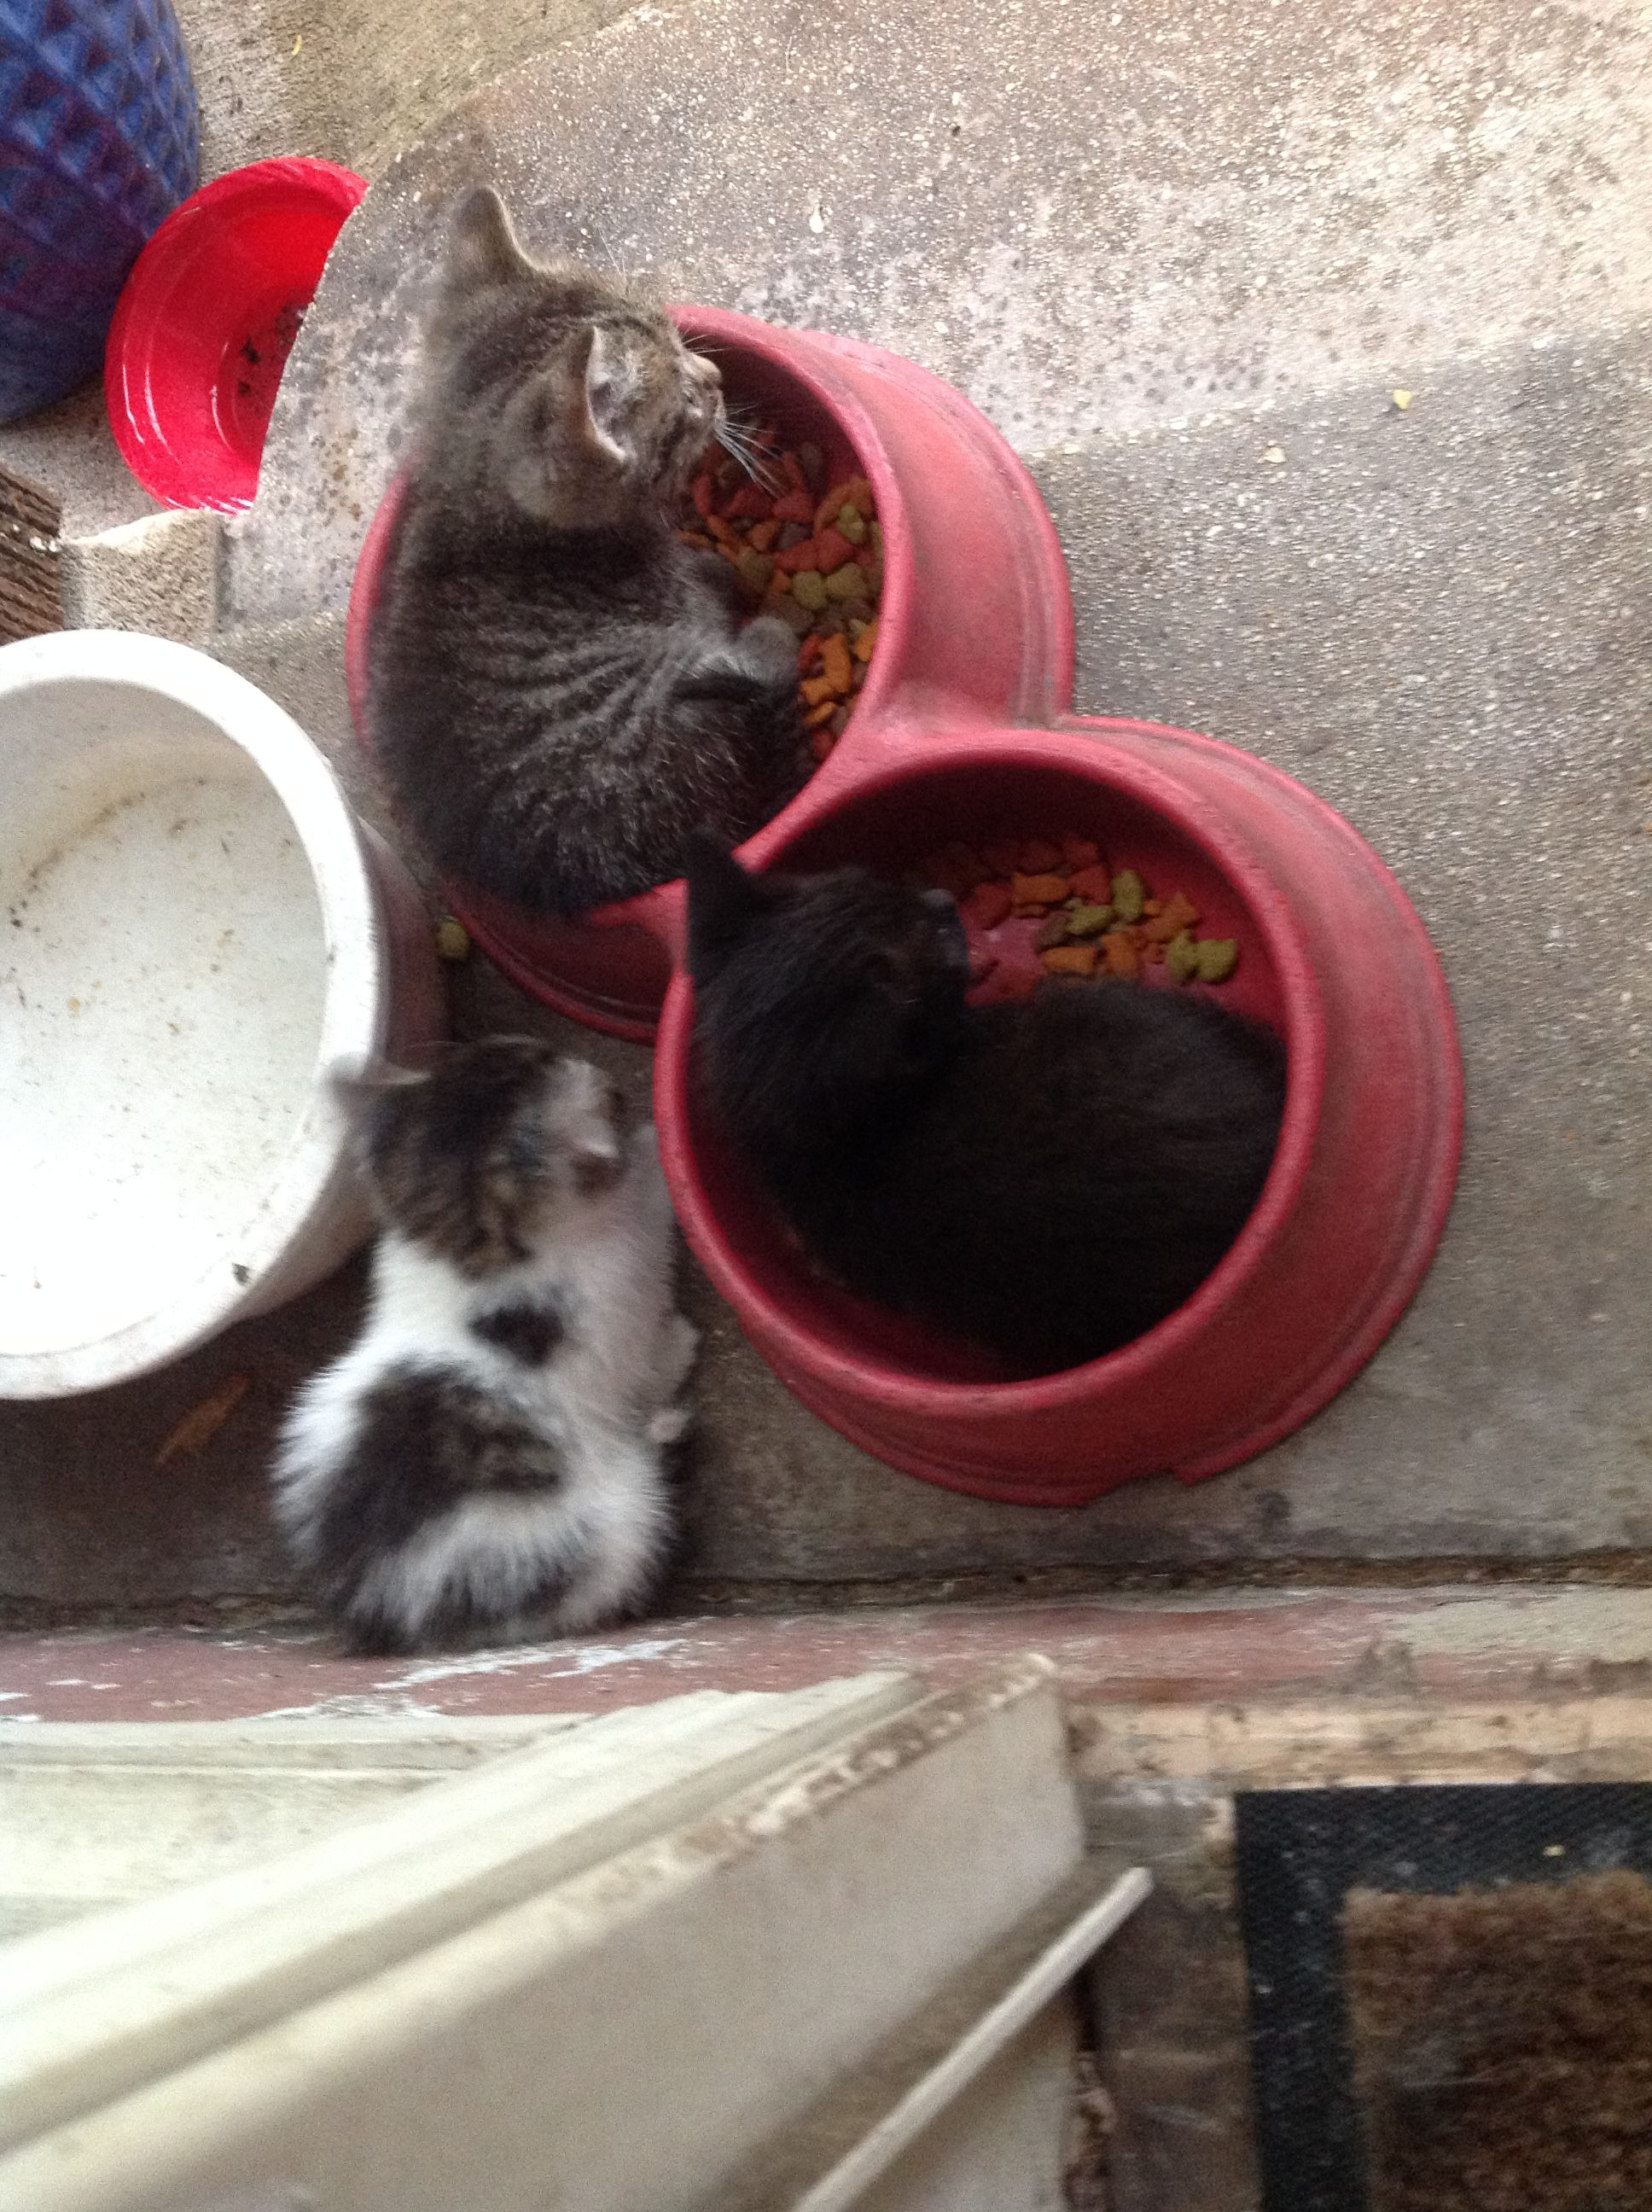 cat eating dog food video